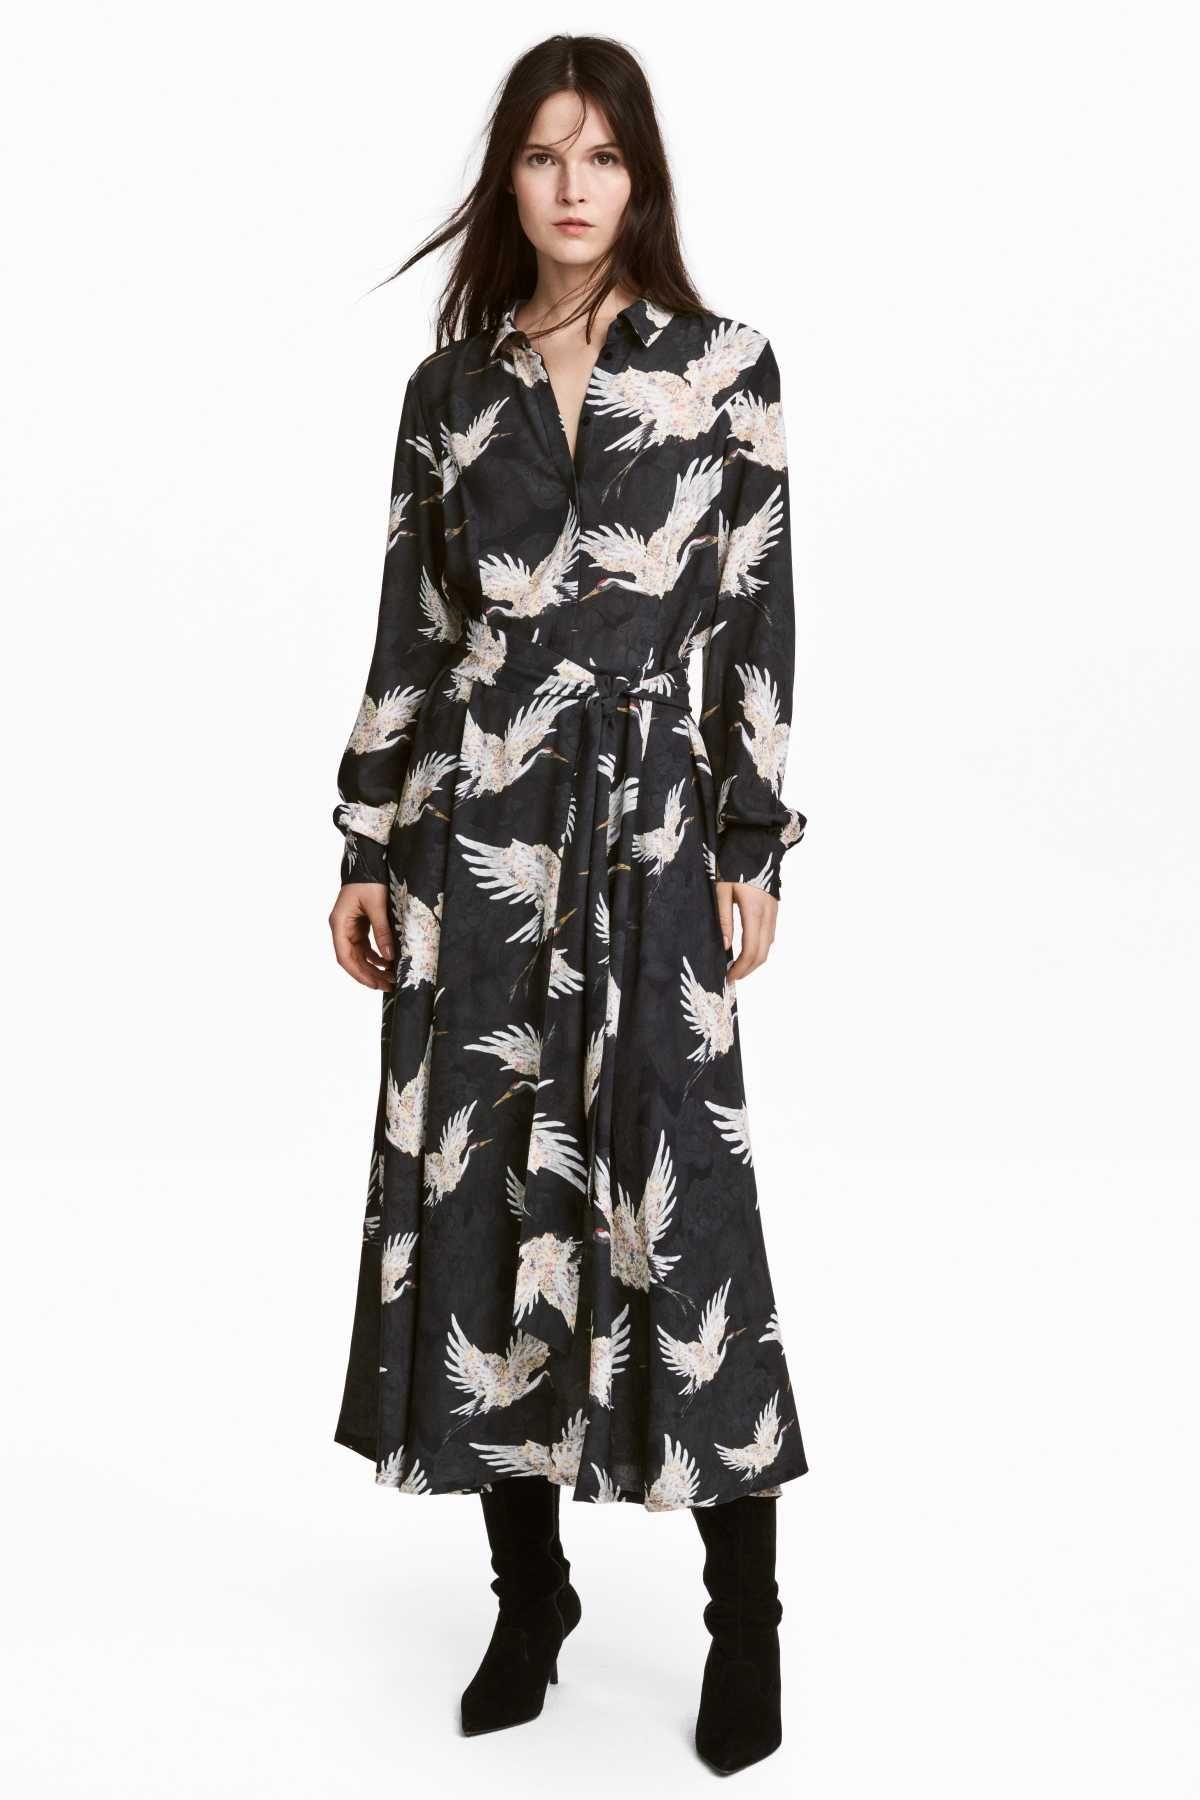 Schwarz/Vögel. Wadenlanges Kleid aus luftigem, gemustertem Webstoff ...